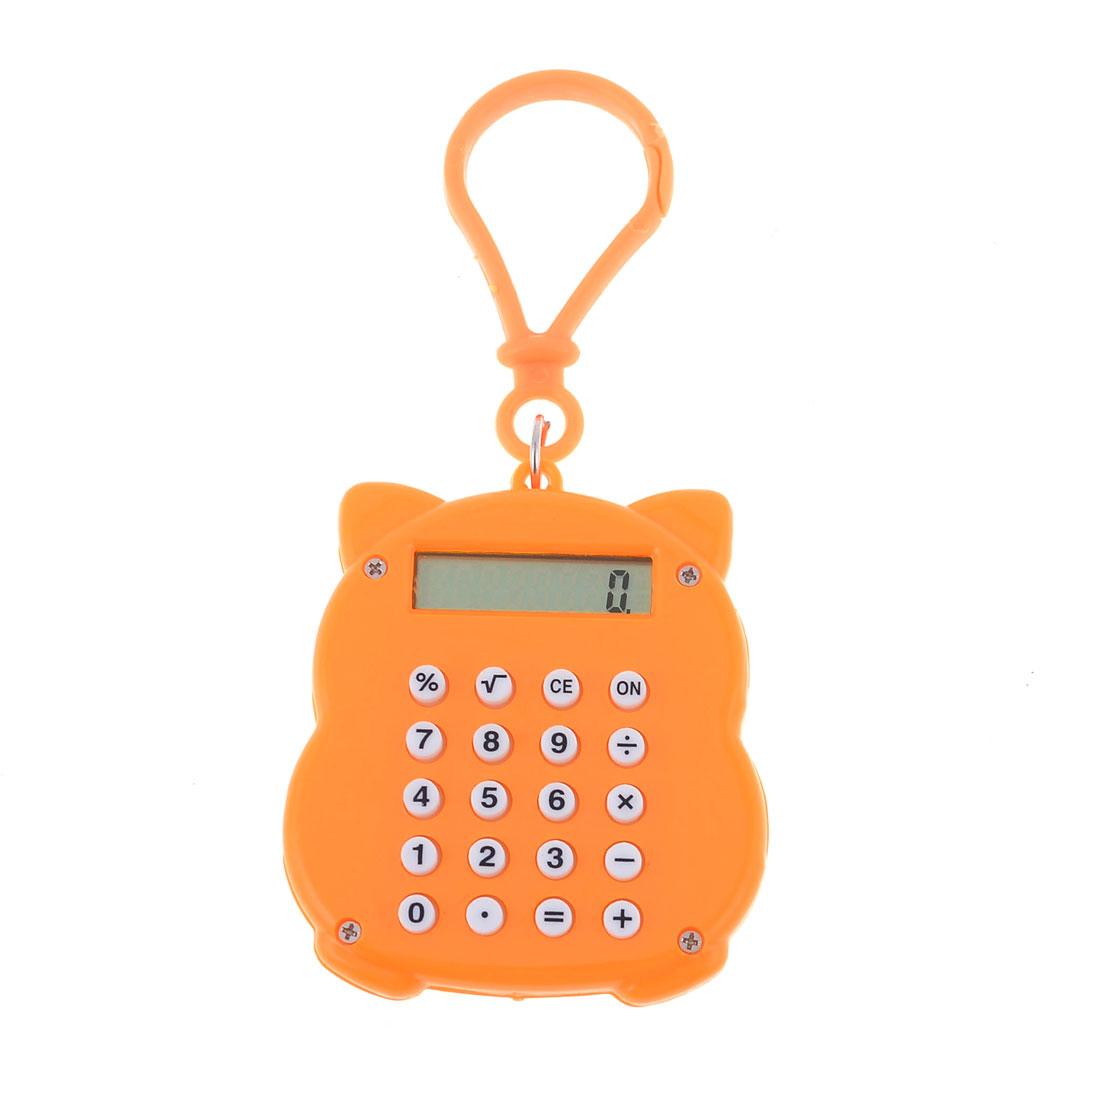 Keyring Decor Orange Plastic Shell Maneki Neko Sahpe Mini Calculator